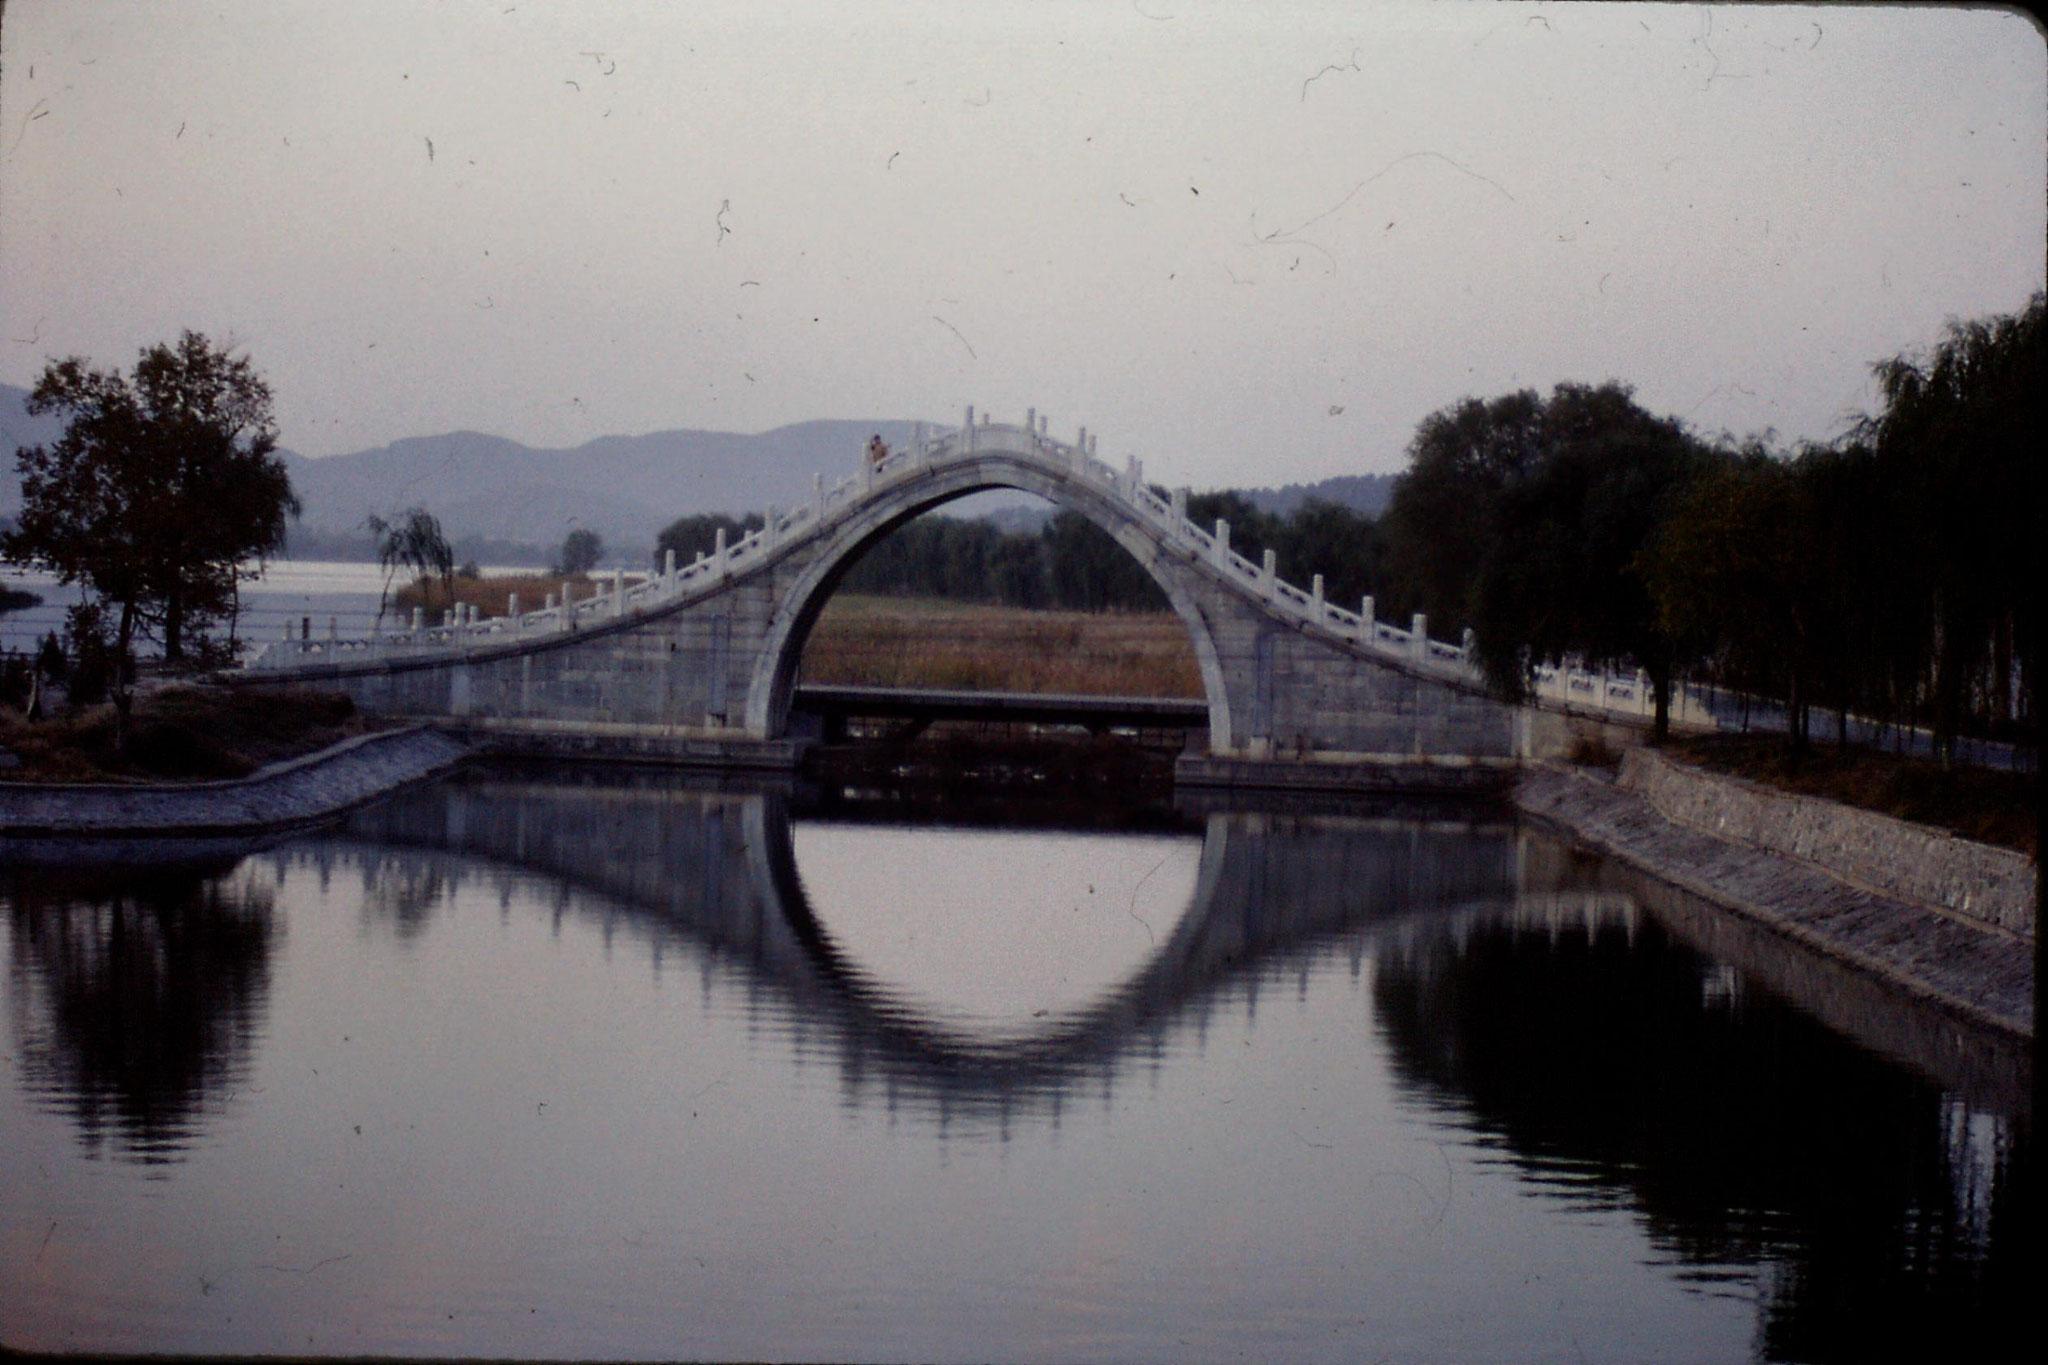 3/11/1988: 17: Summer Palace park